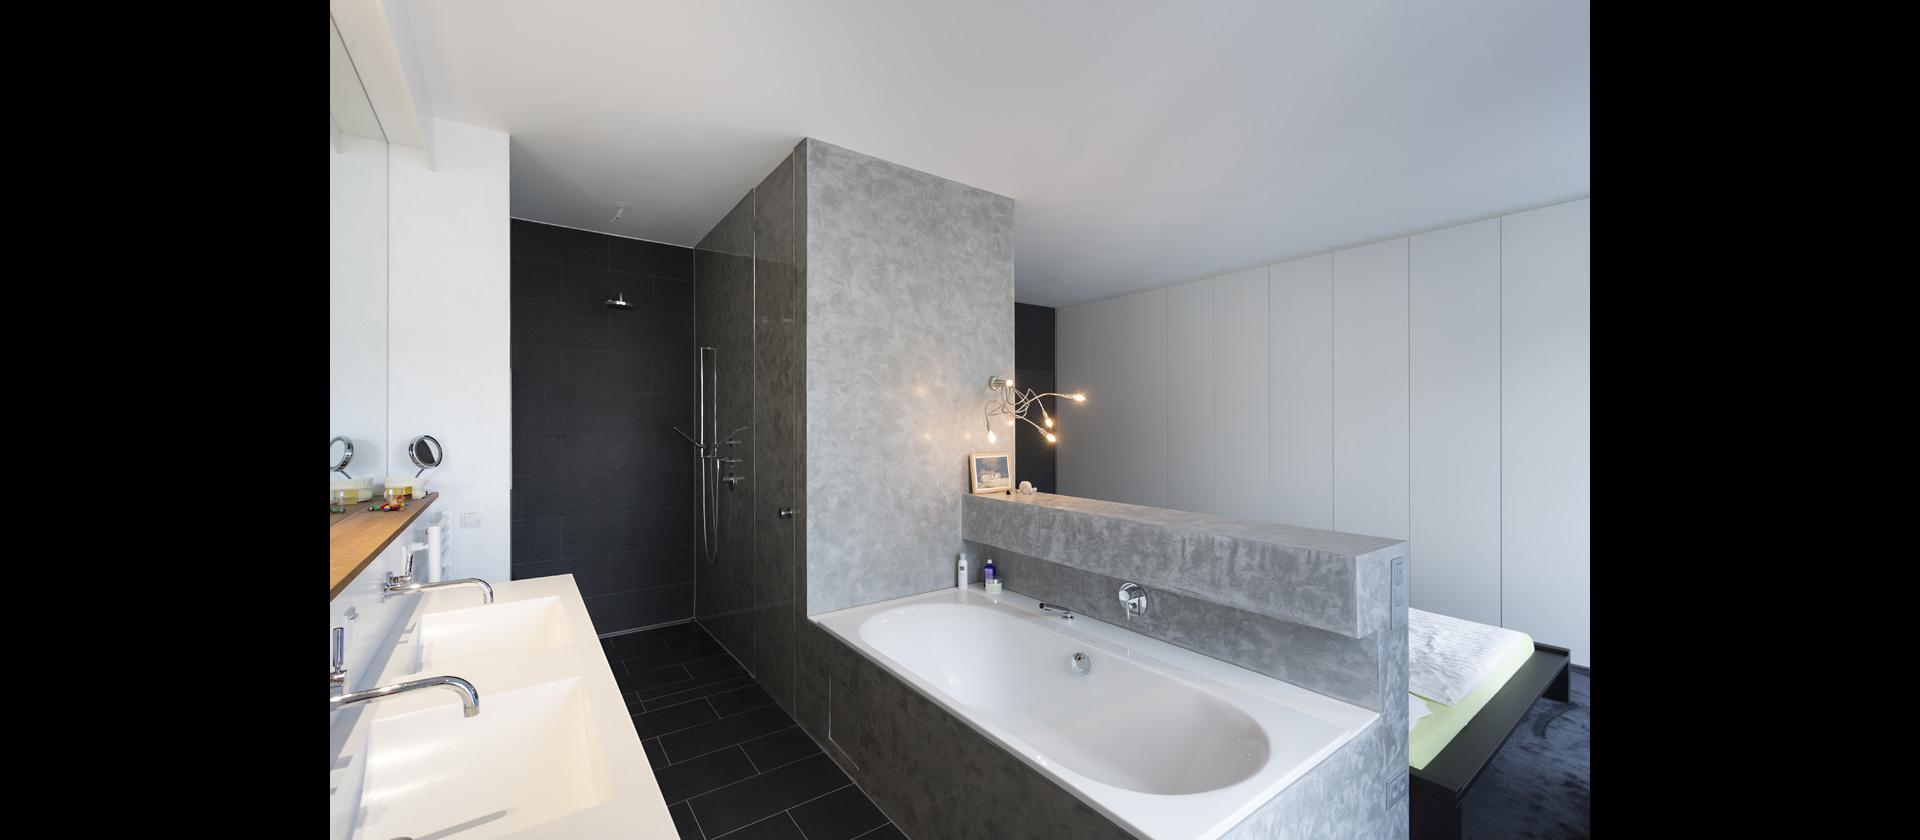 mtb badm bel mineralwerkstoff t rkis weiss matt. Black Bedroom Furniture Sets. Home Design Ideas